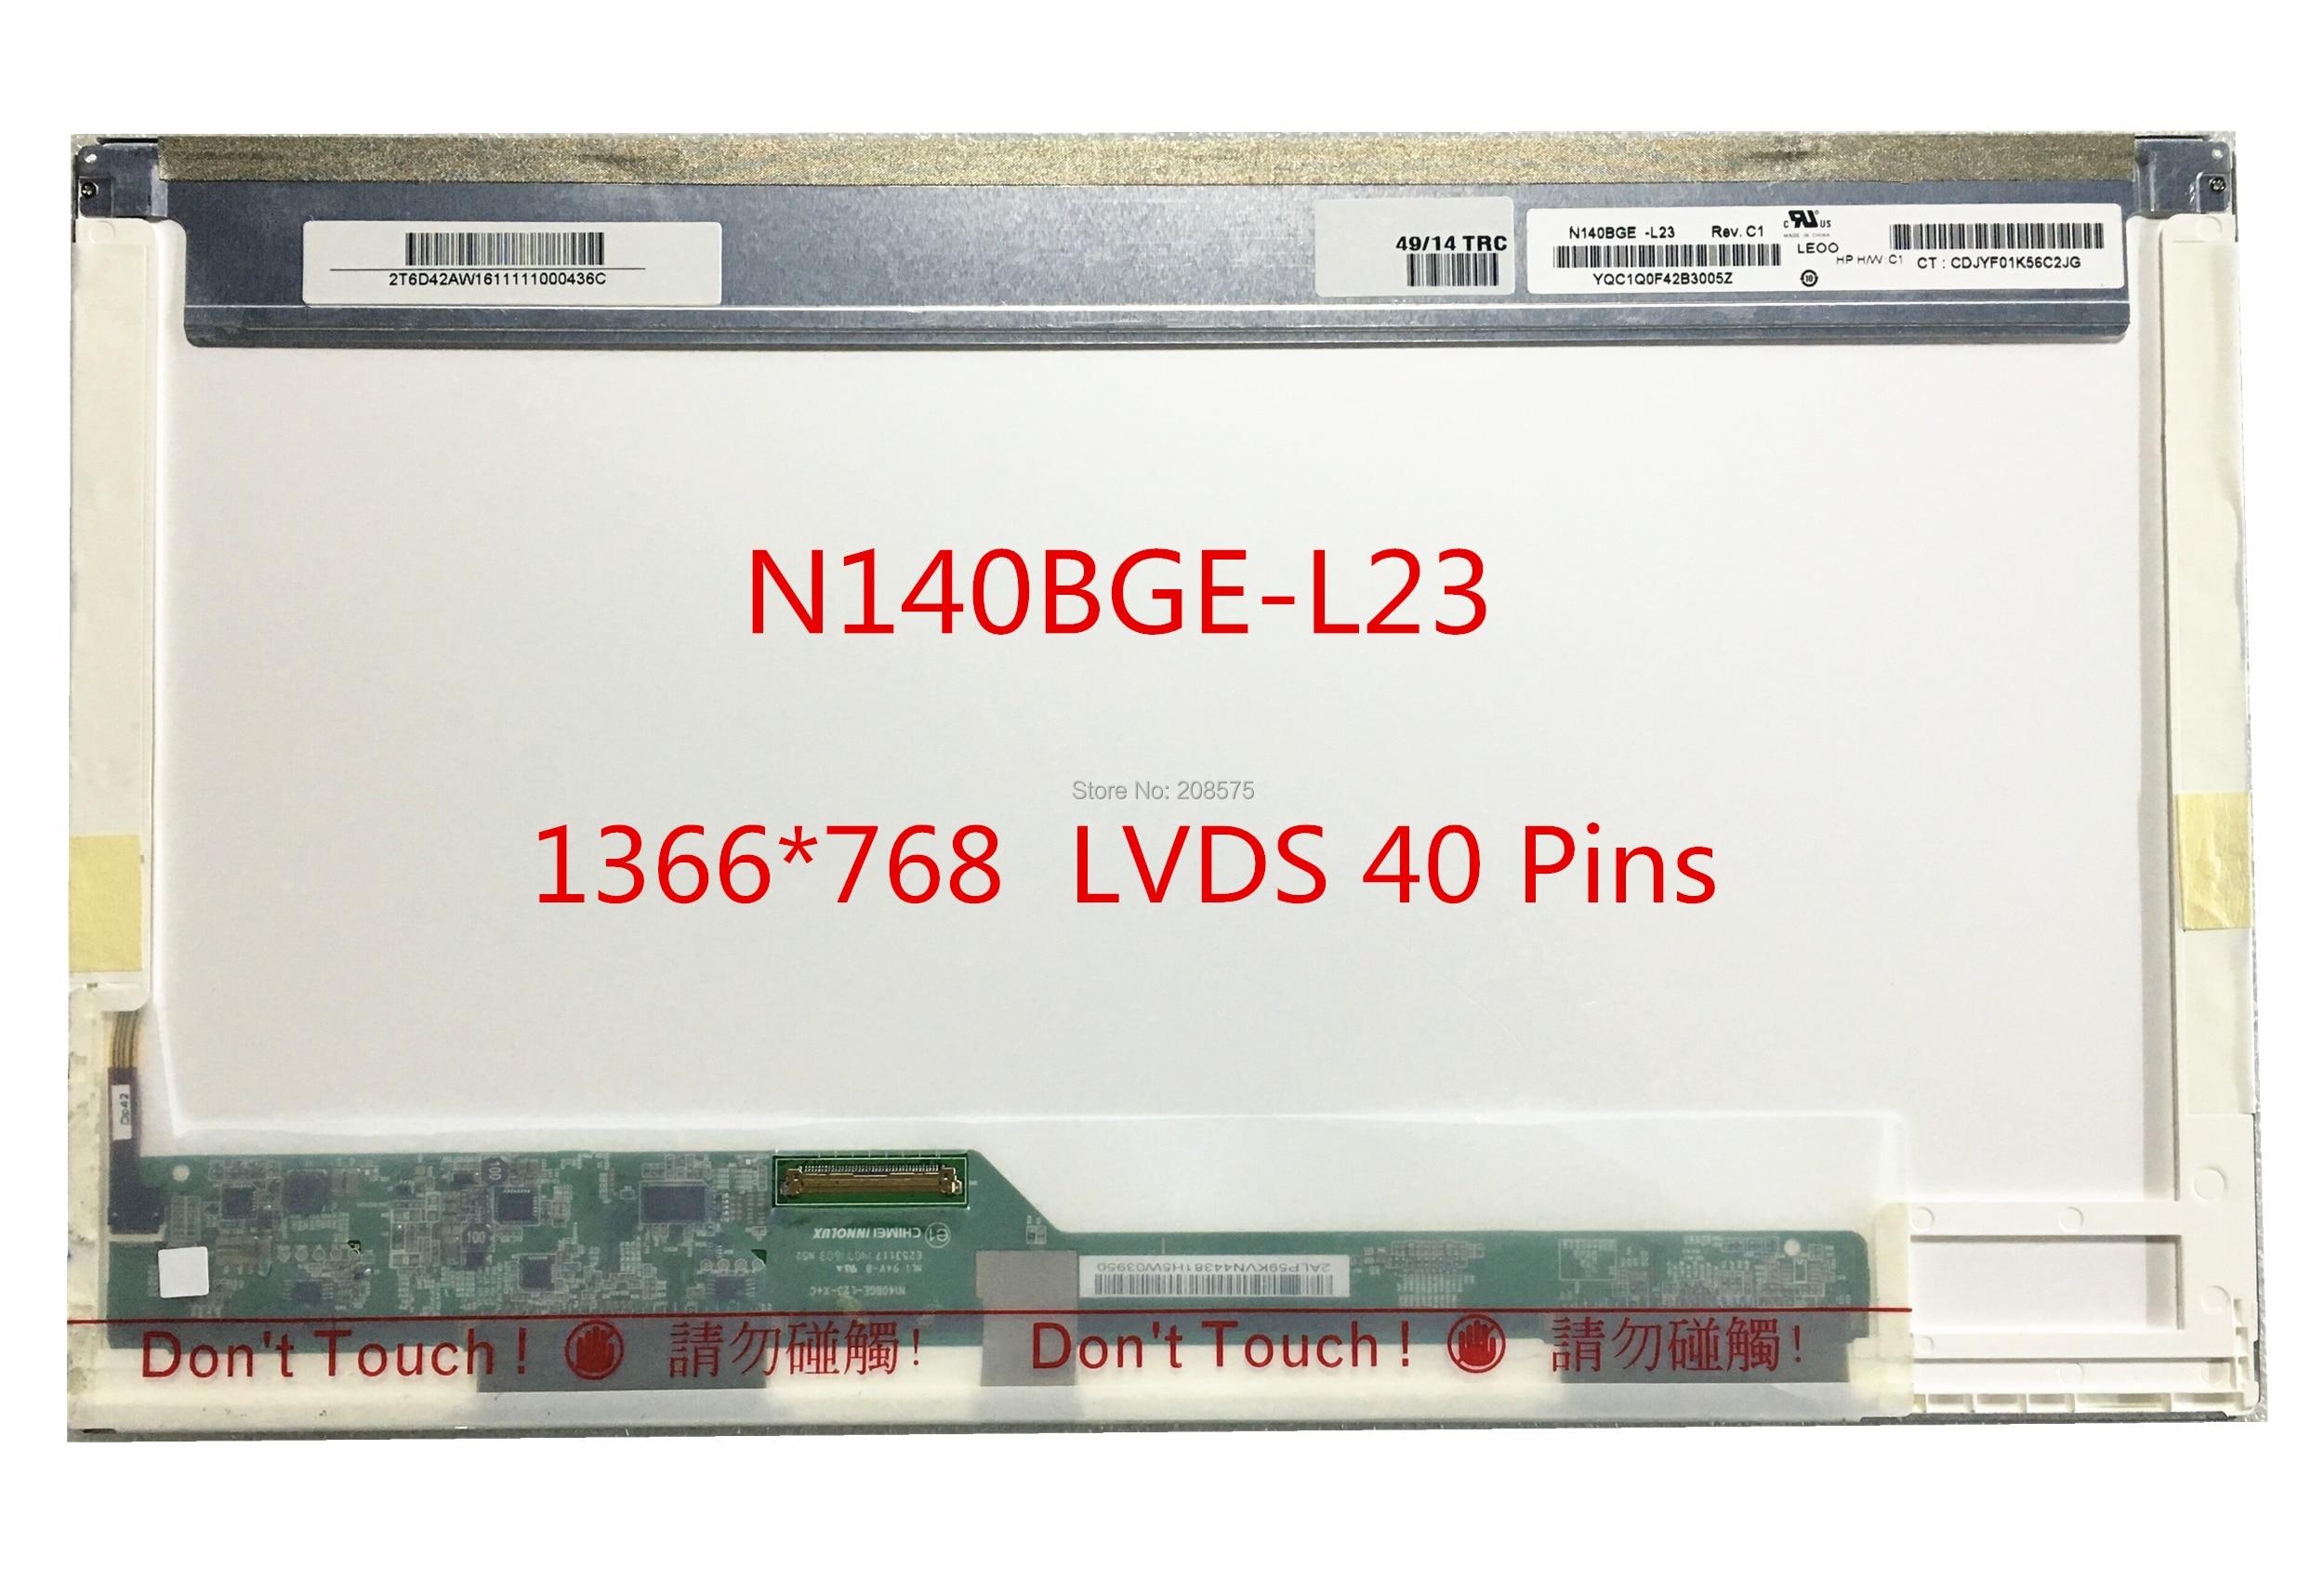 Livraison gratuite N140BGE-L23 N140BGE L23 L22 L21 L11 N140BGE-L12 BT140GW01 LP140WH1 TLA1 LTN140AT02 B140XW01 V.8 V.9 40pinsLivraison gratuite N140BGE-L23 N140BGE L23 L22 L21 L11 N140BGE-L12 BT140GW01 LP140WH1 TLA1 LTN140AT02 B140XW01 V.8 V.9 40pins